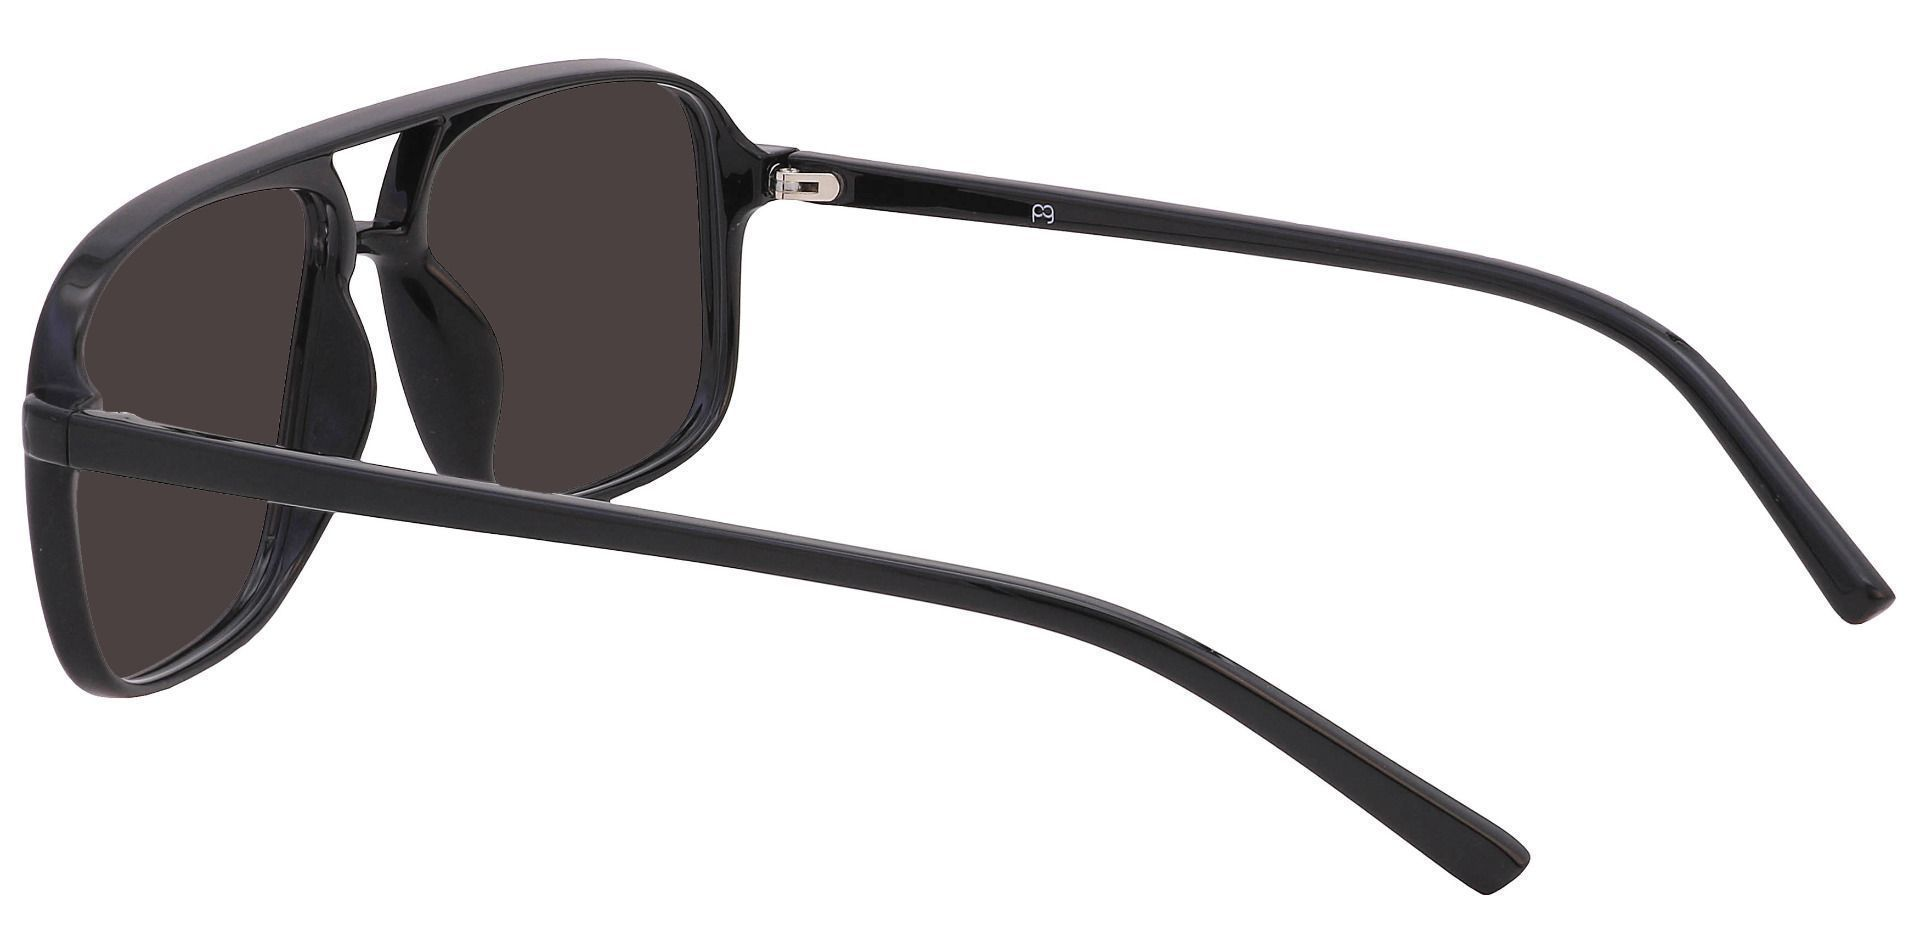 Atwood Aviator Prescription Sunglasses - Black Frame With Gray Lenses